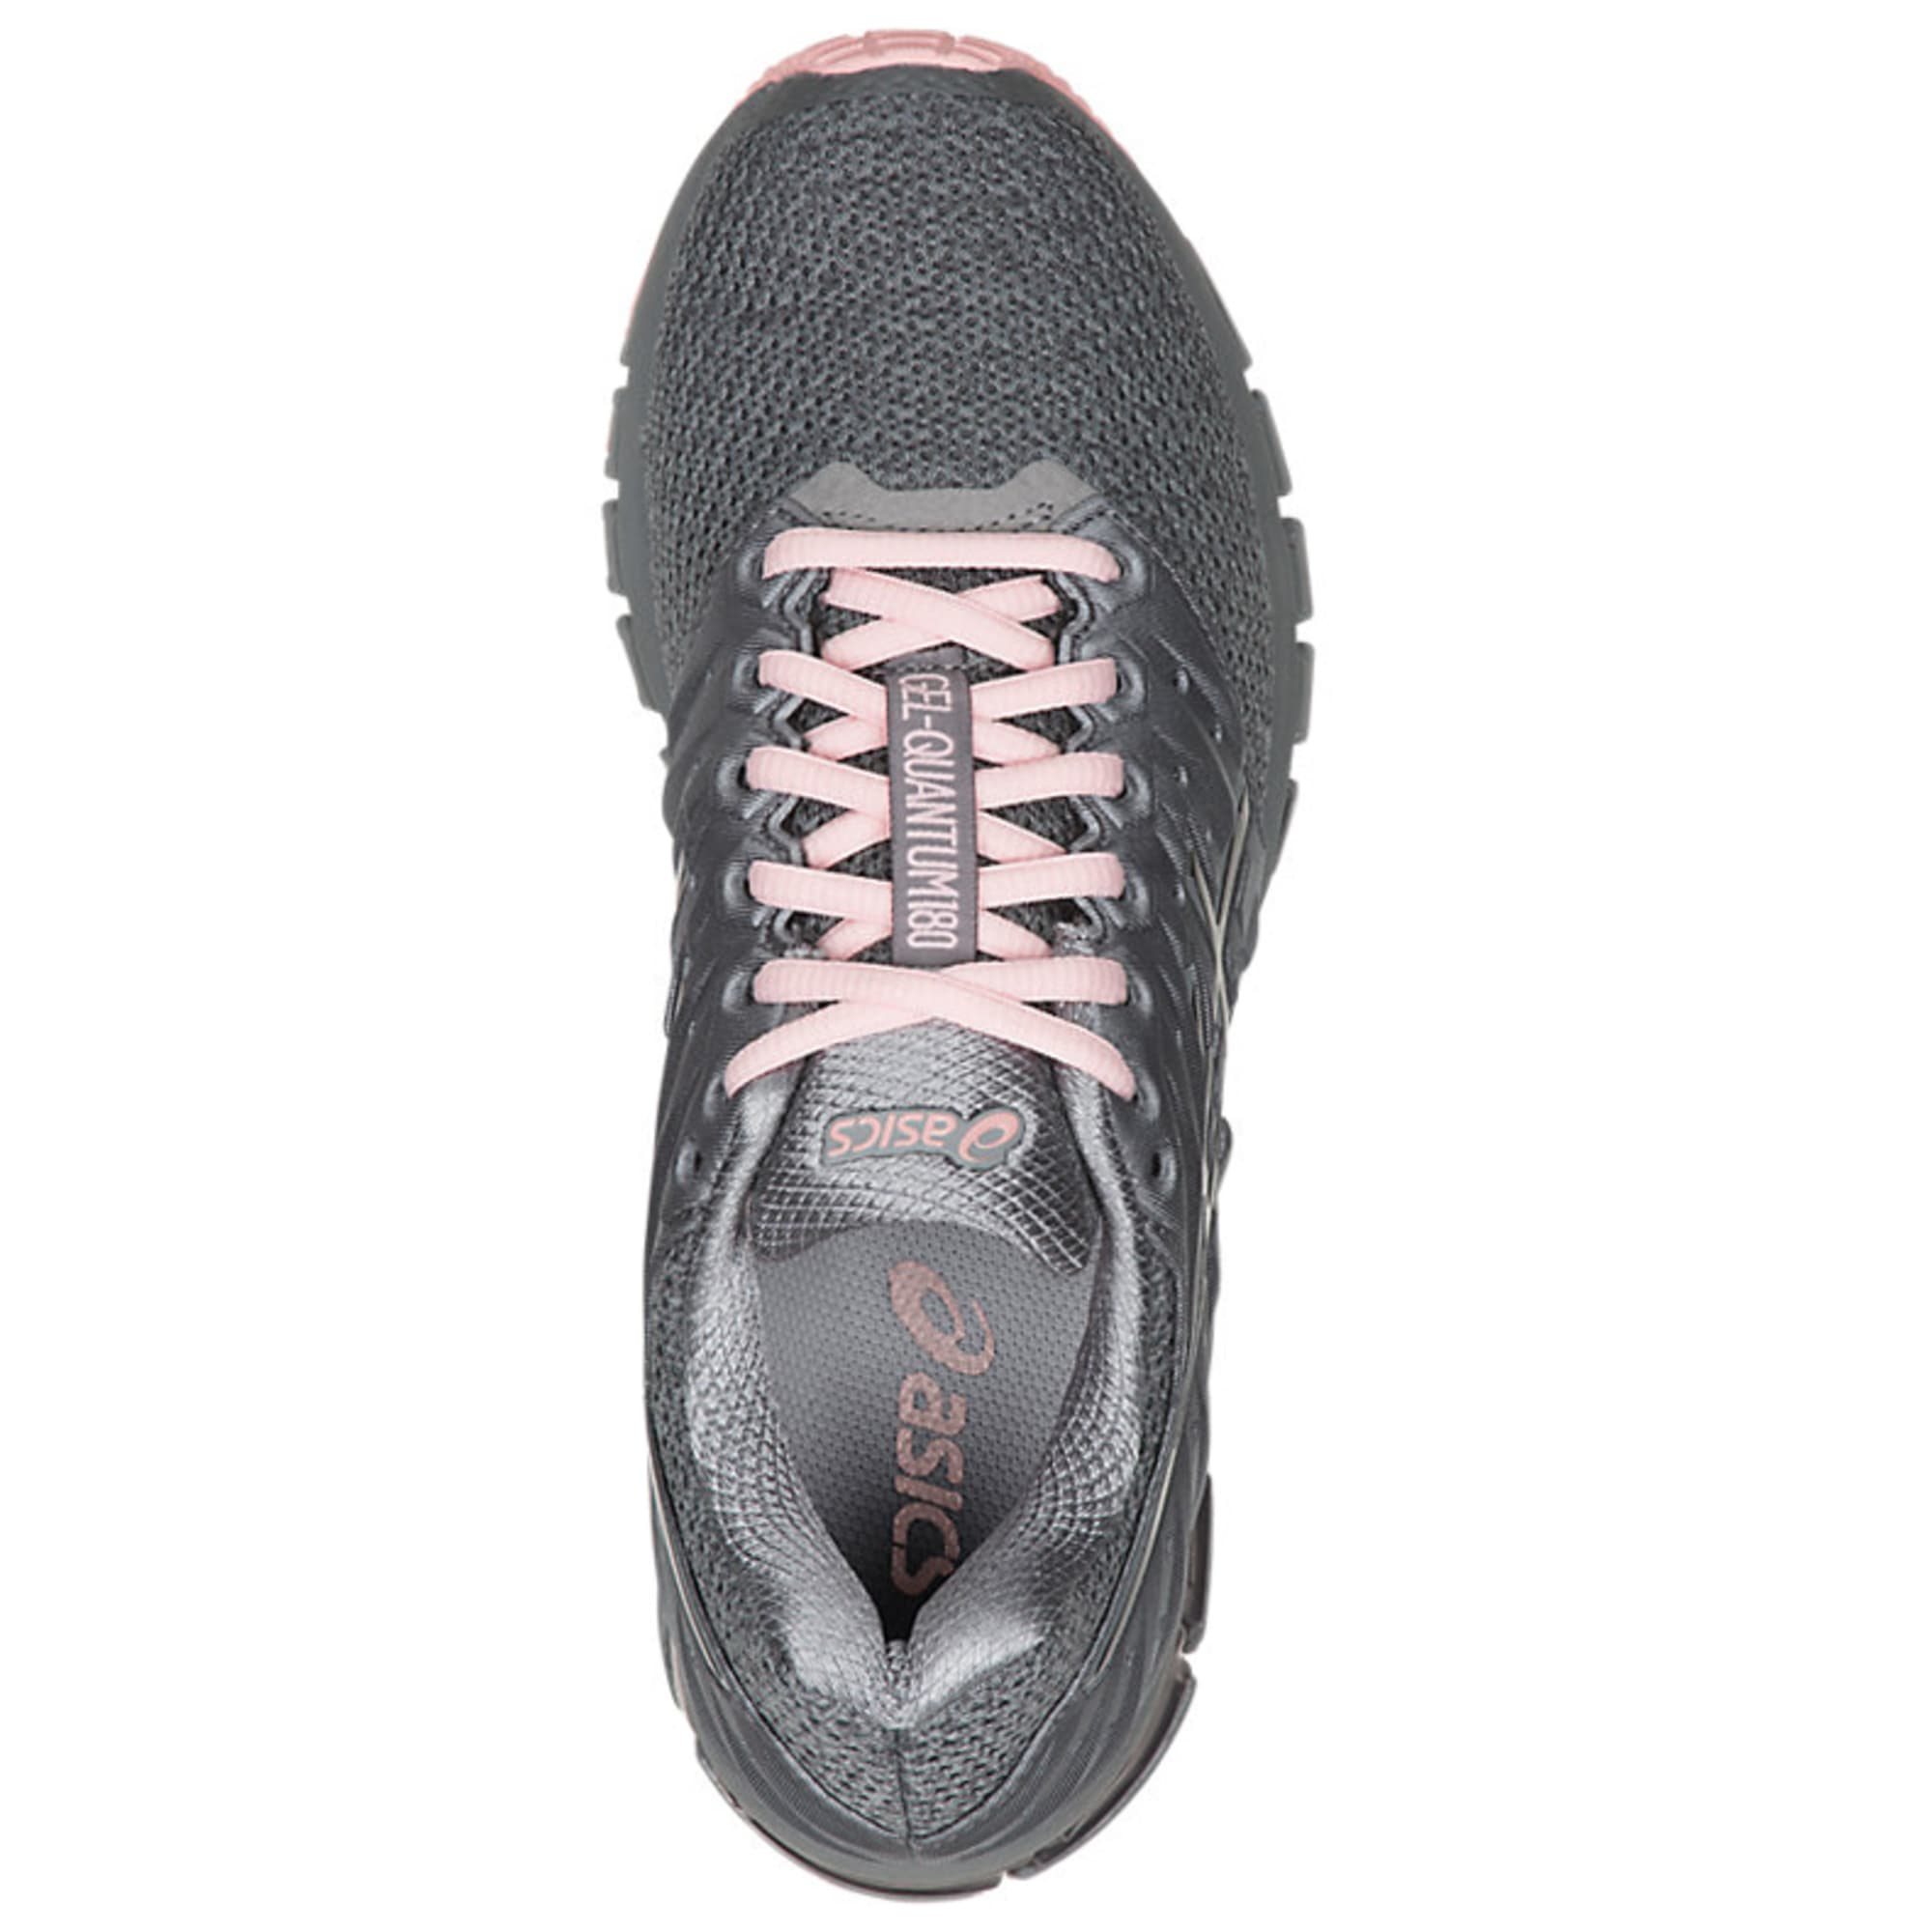 casalinga Accettato Biblioteca del bagagliaio  ASICS Women's GEL-Quantum 180 2 MX Running Shoes - Bob's Stores